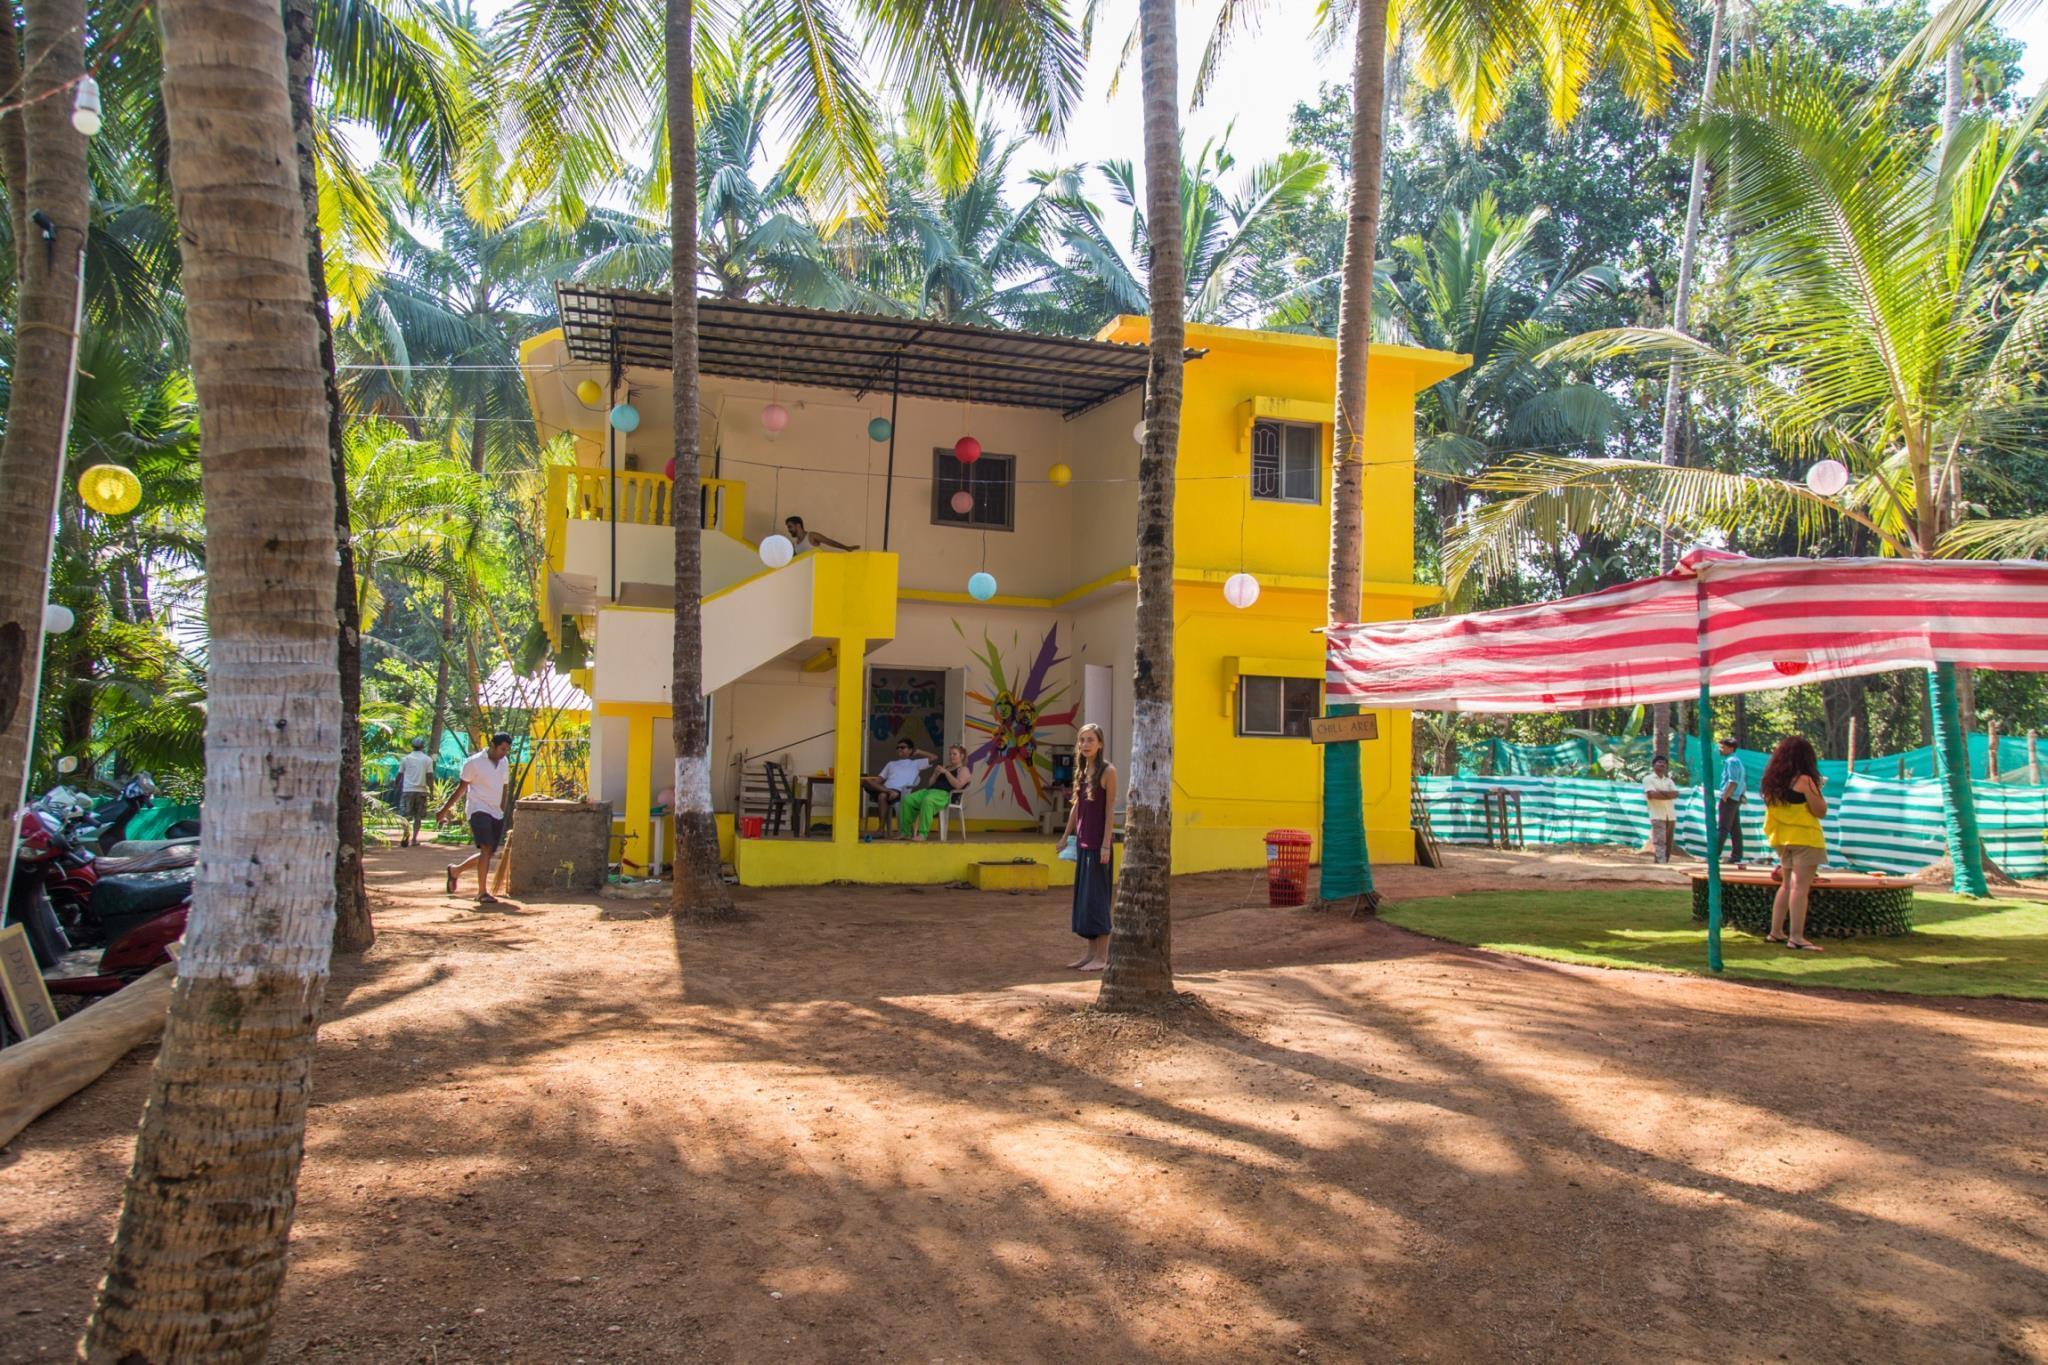 Roadhouse Hostels Palolem Goa Reviews